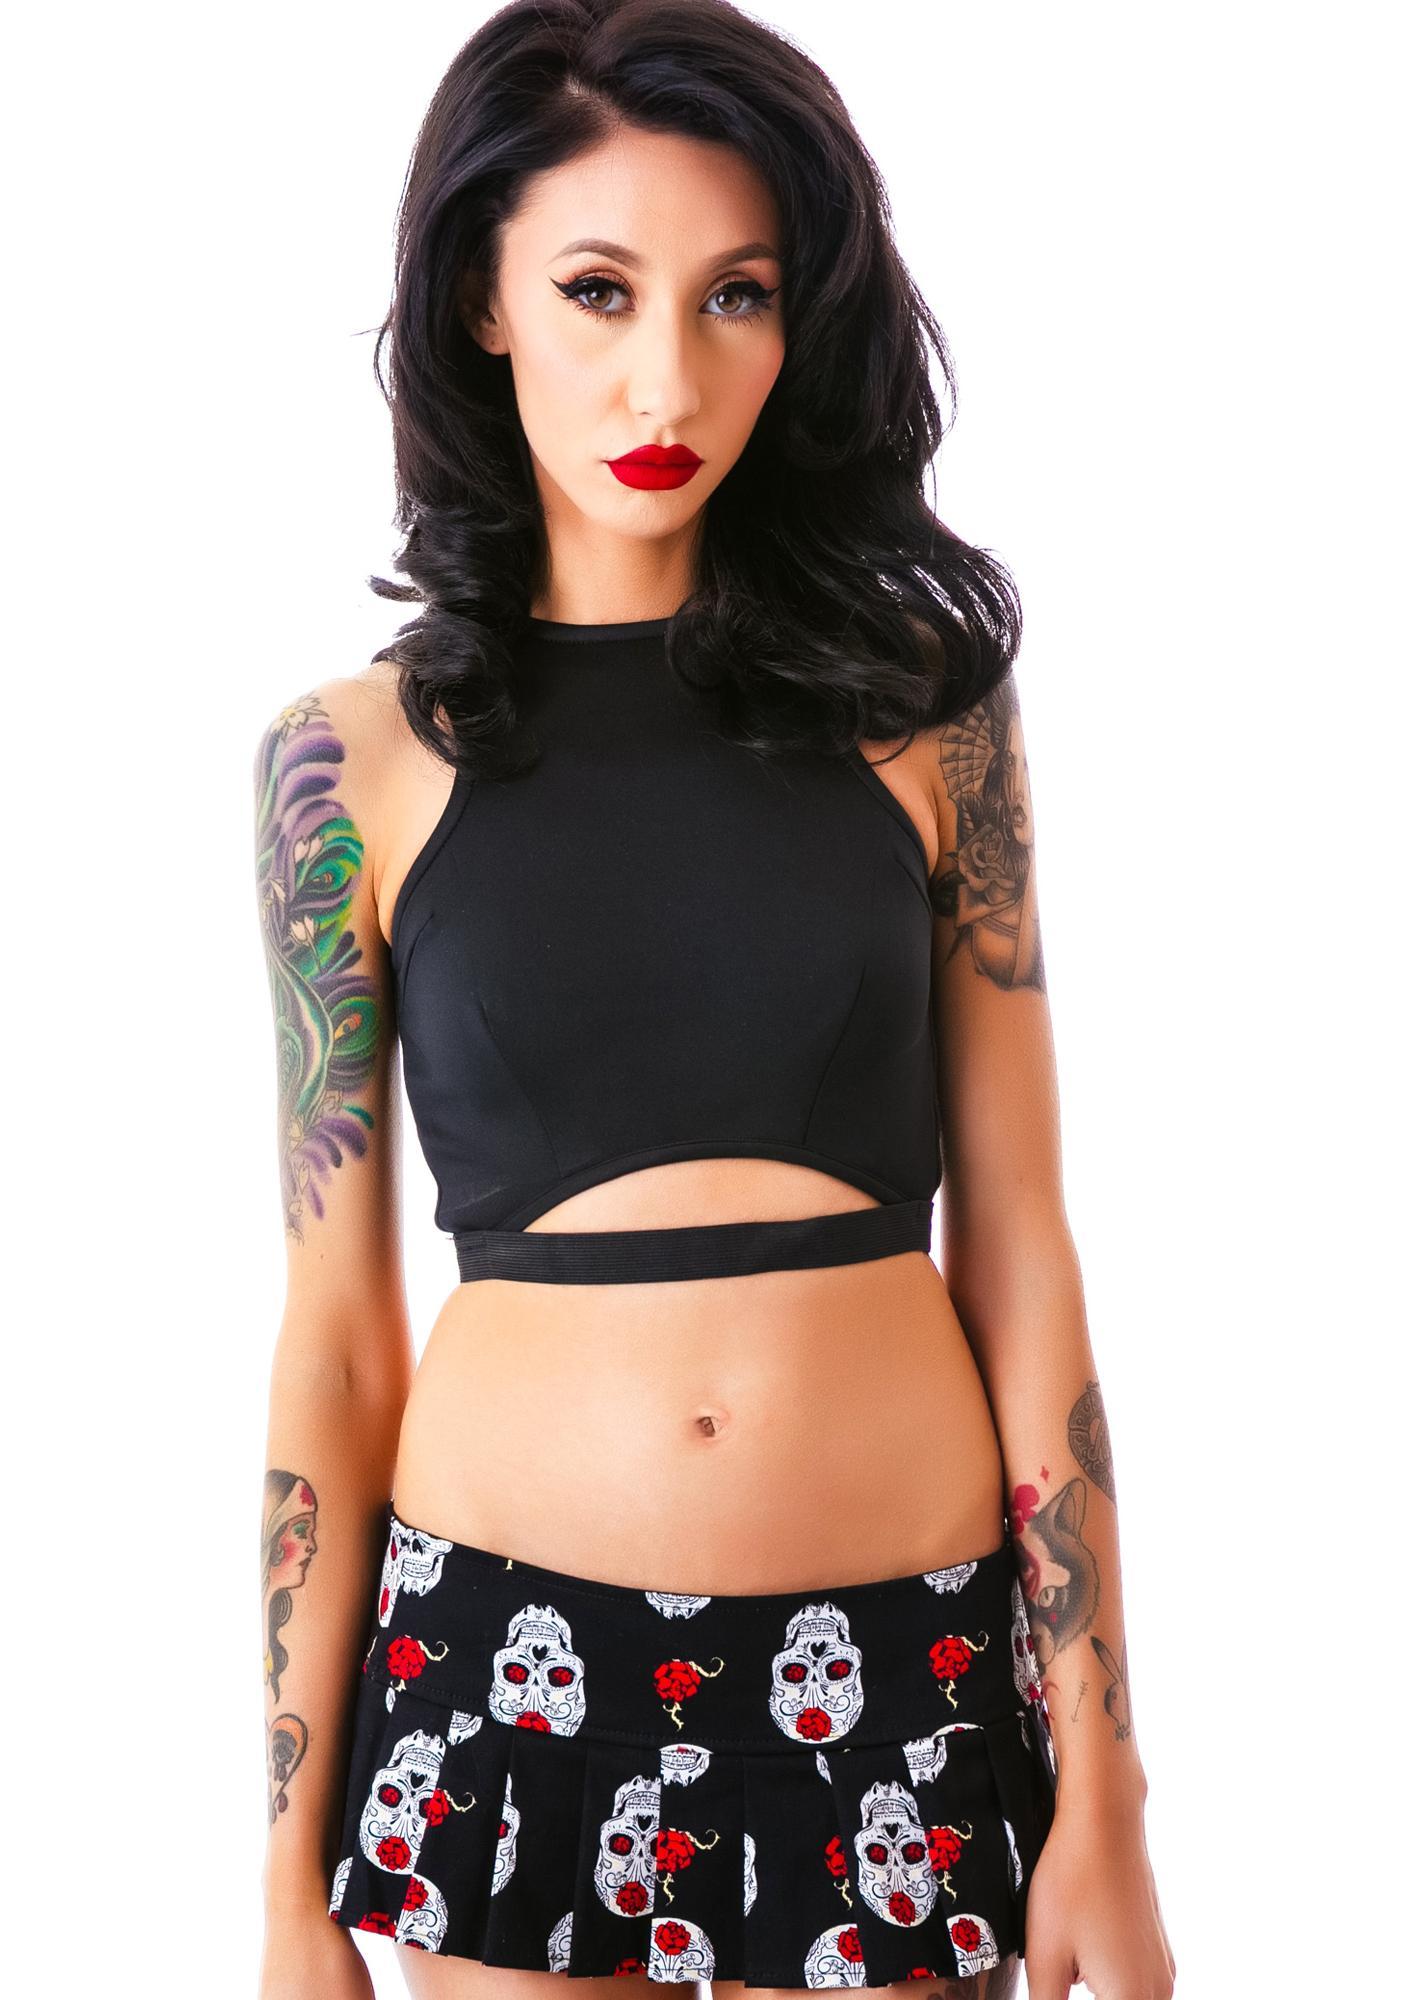 Calavera Skirt